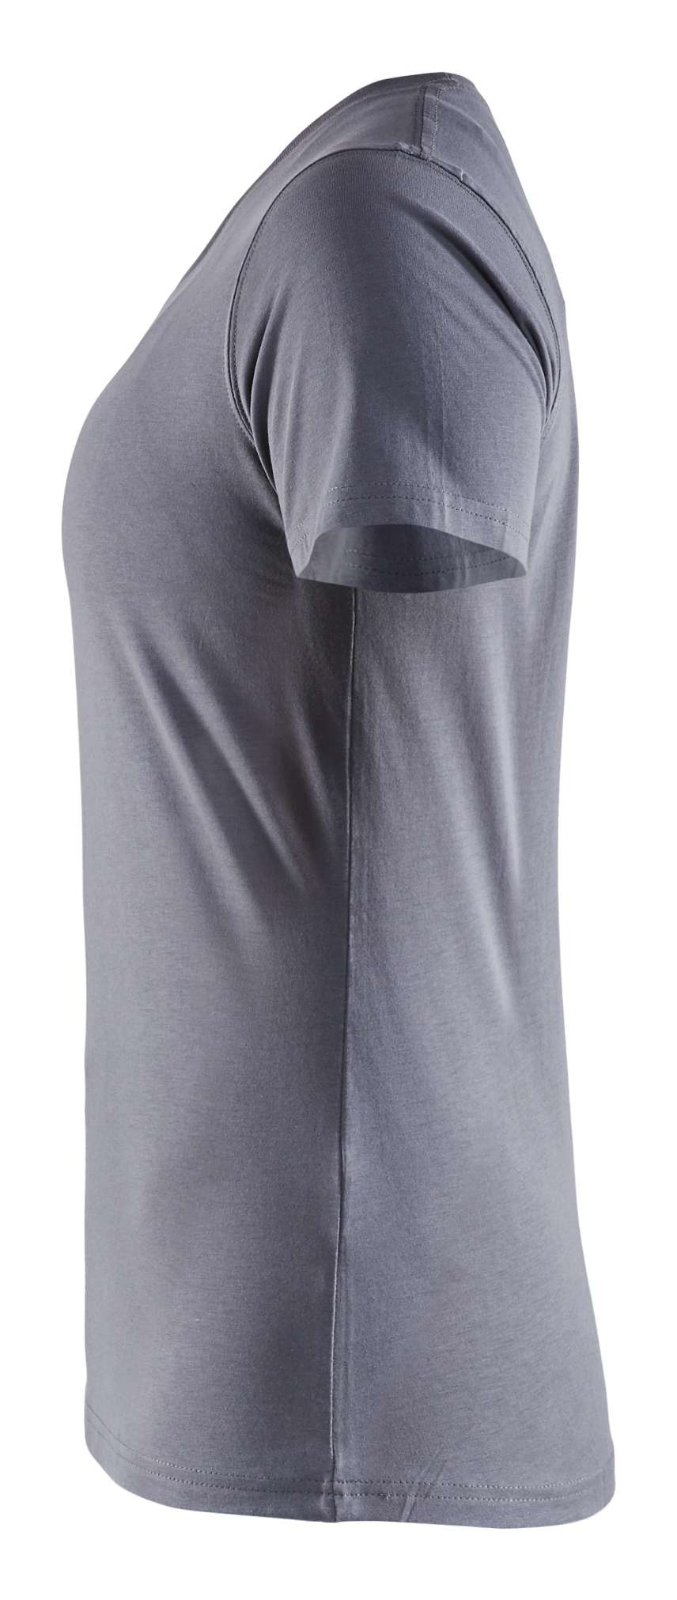 Blaklader T-shirts 33341042 grijs(9400)